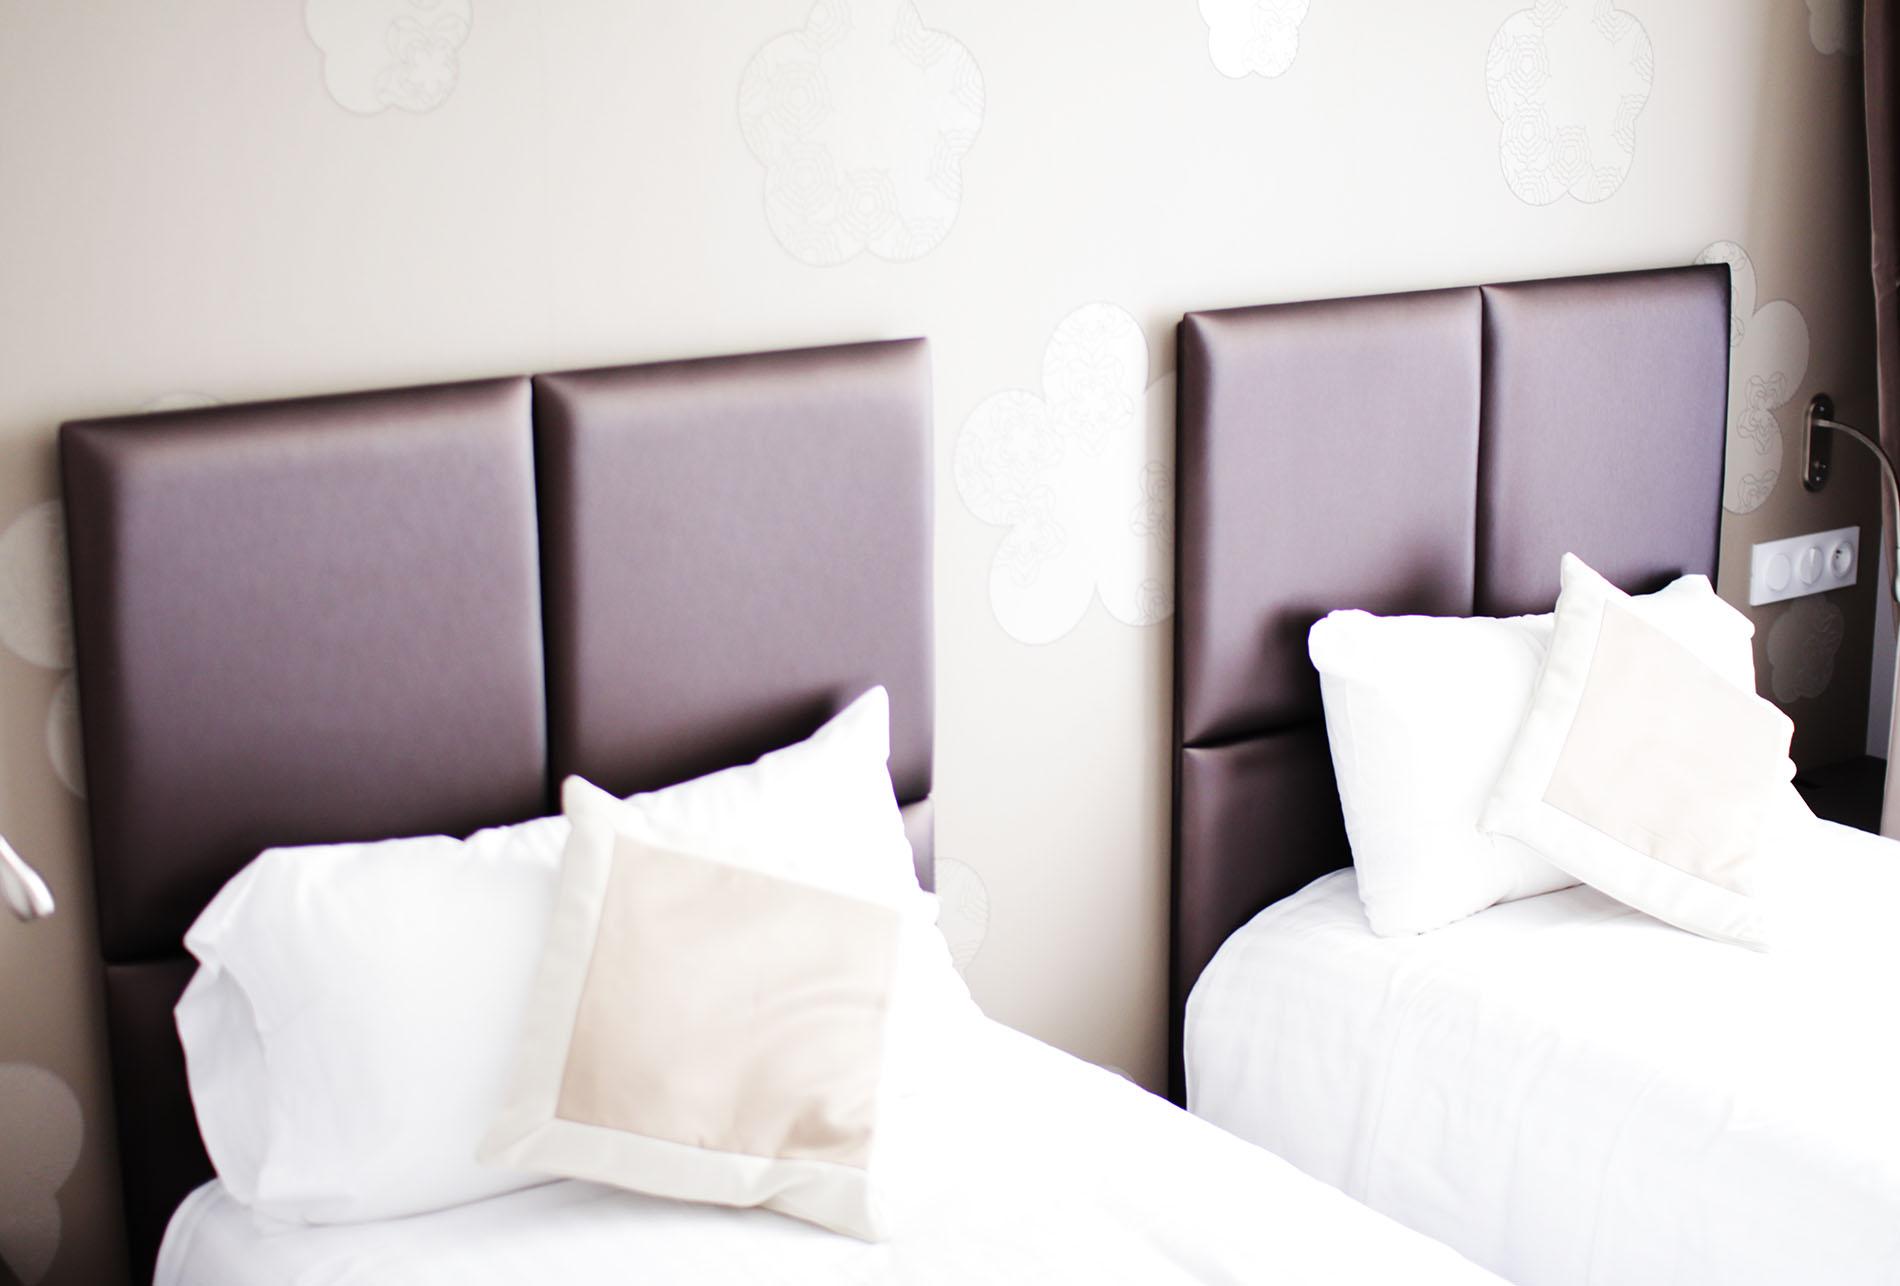 SIF_Hotel dOrleans_8